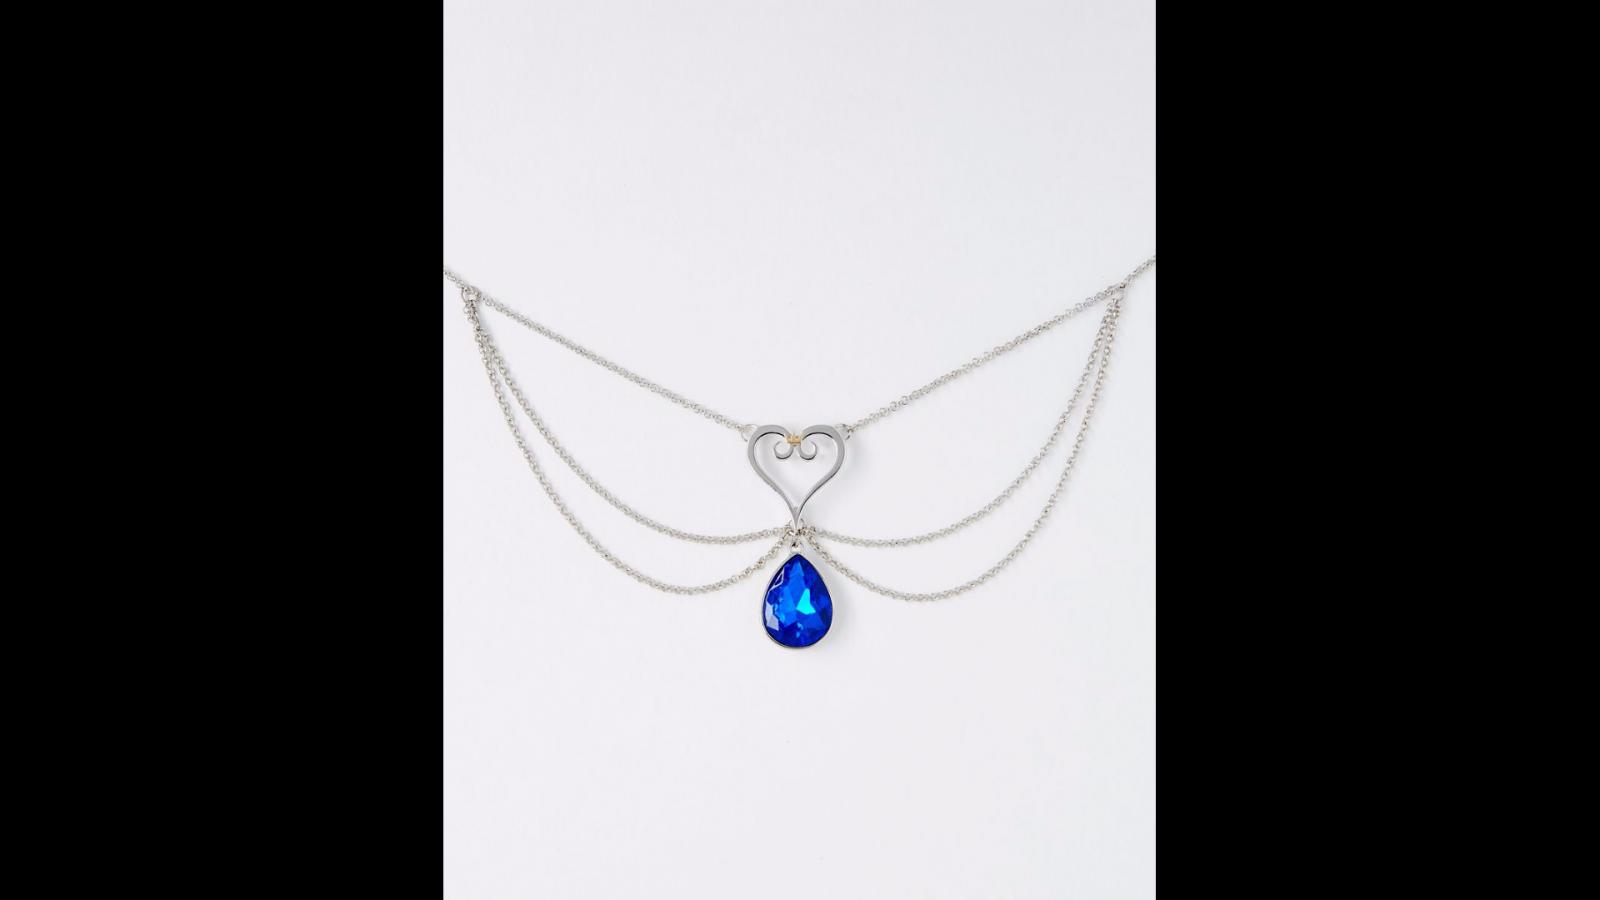 Spencer's Kingdom Hearts Necklace